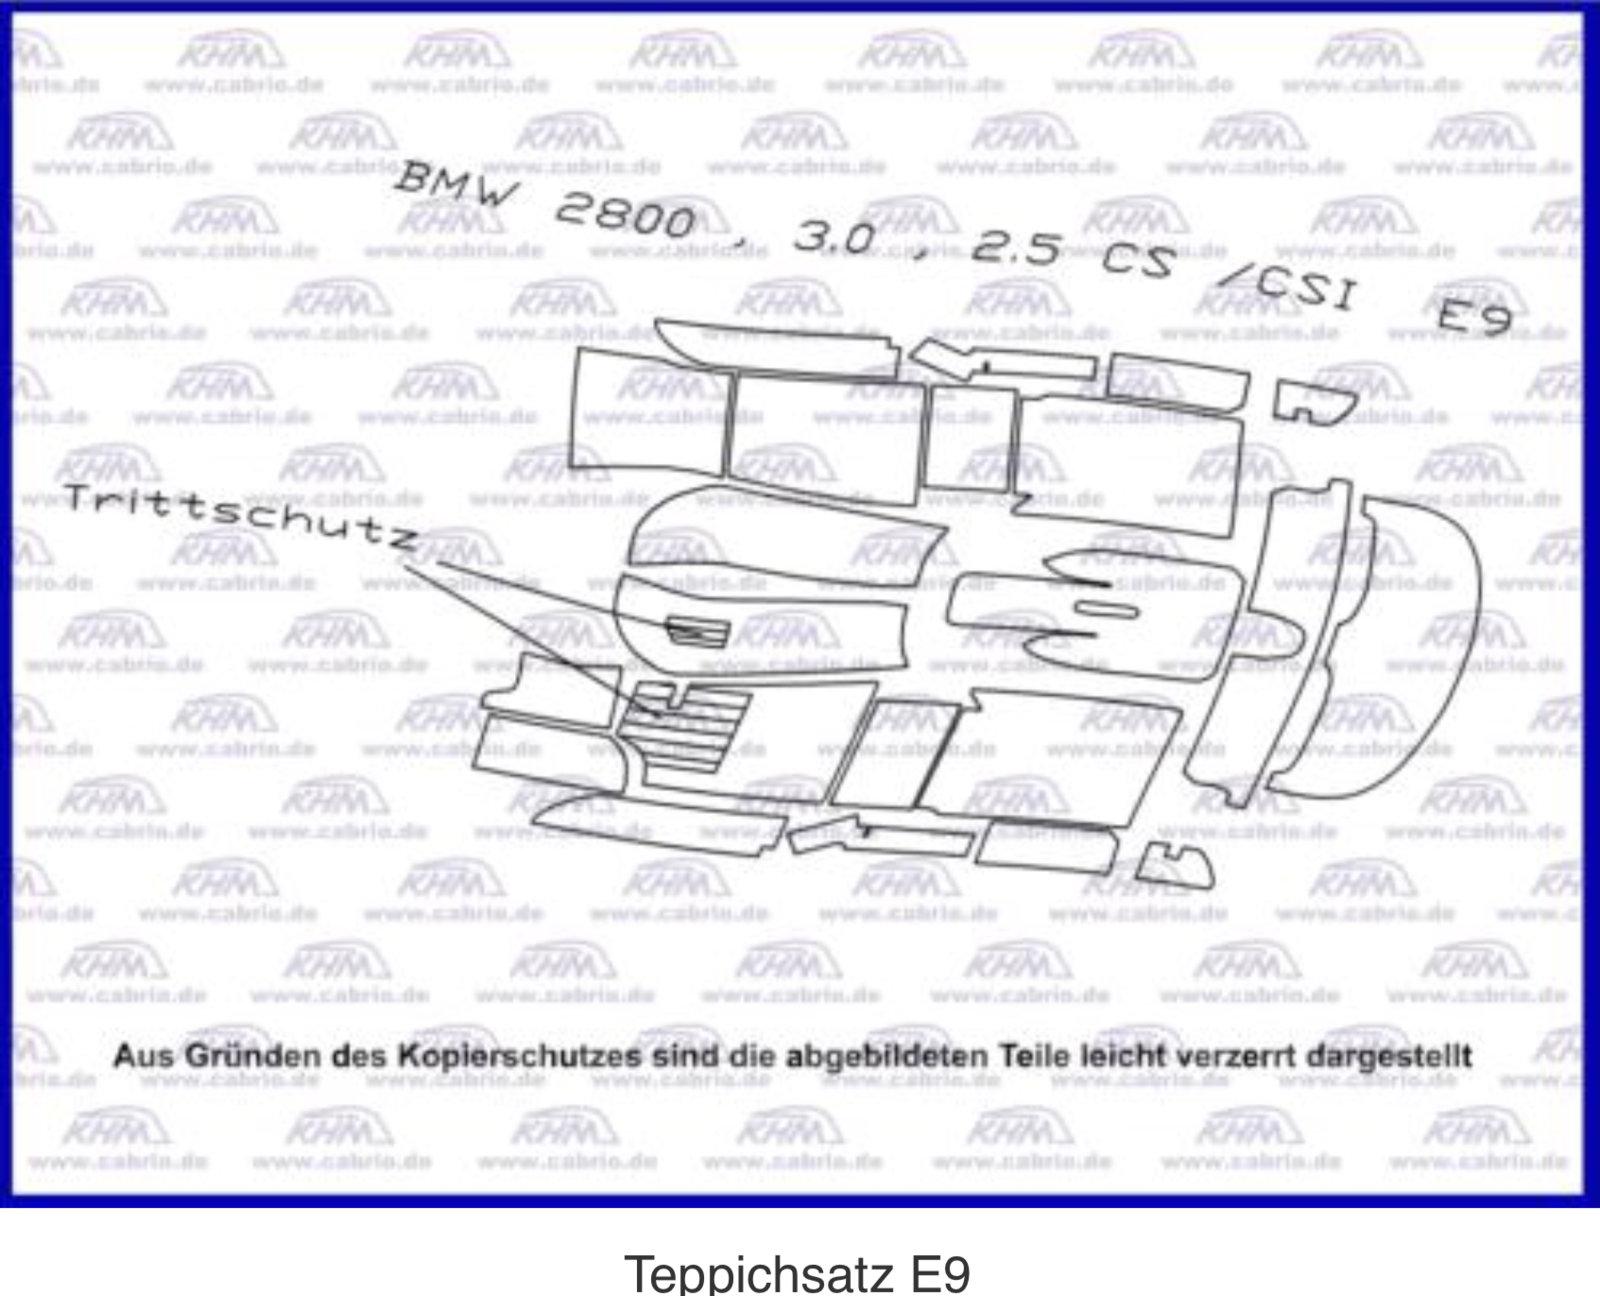 33F3AE1B-1EF9-4913-B69C-EE4B38564179.jpeg